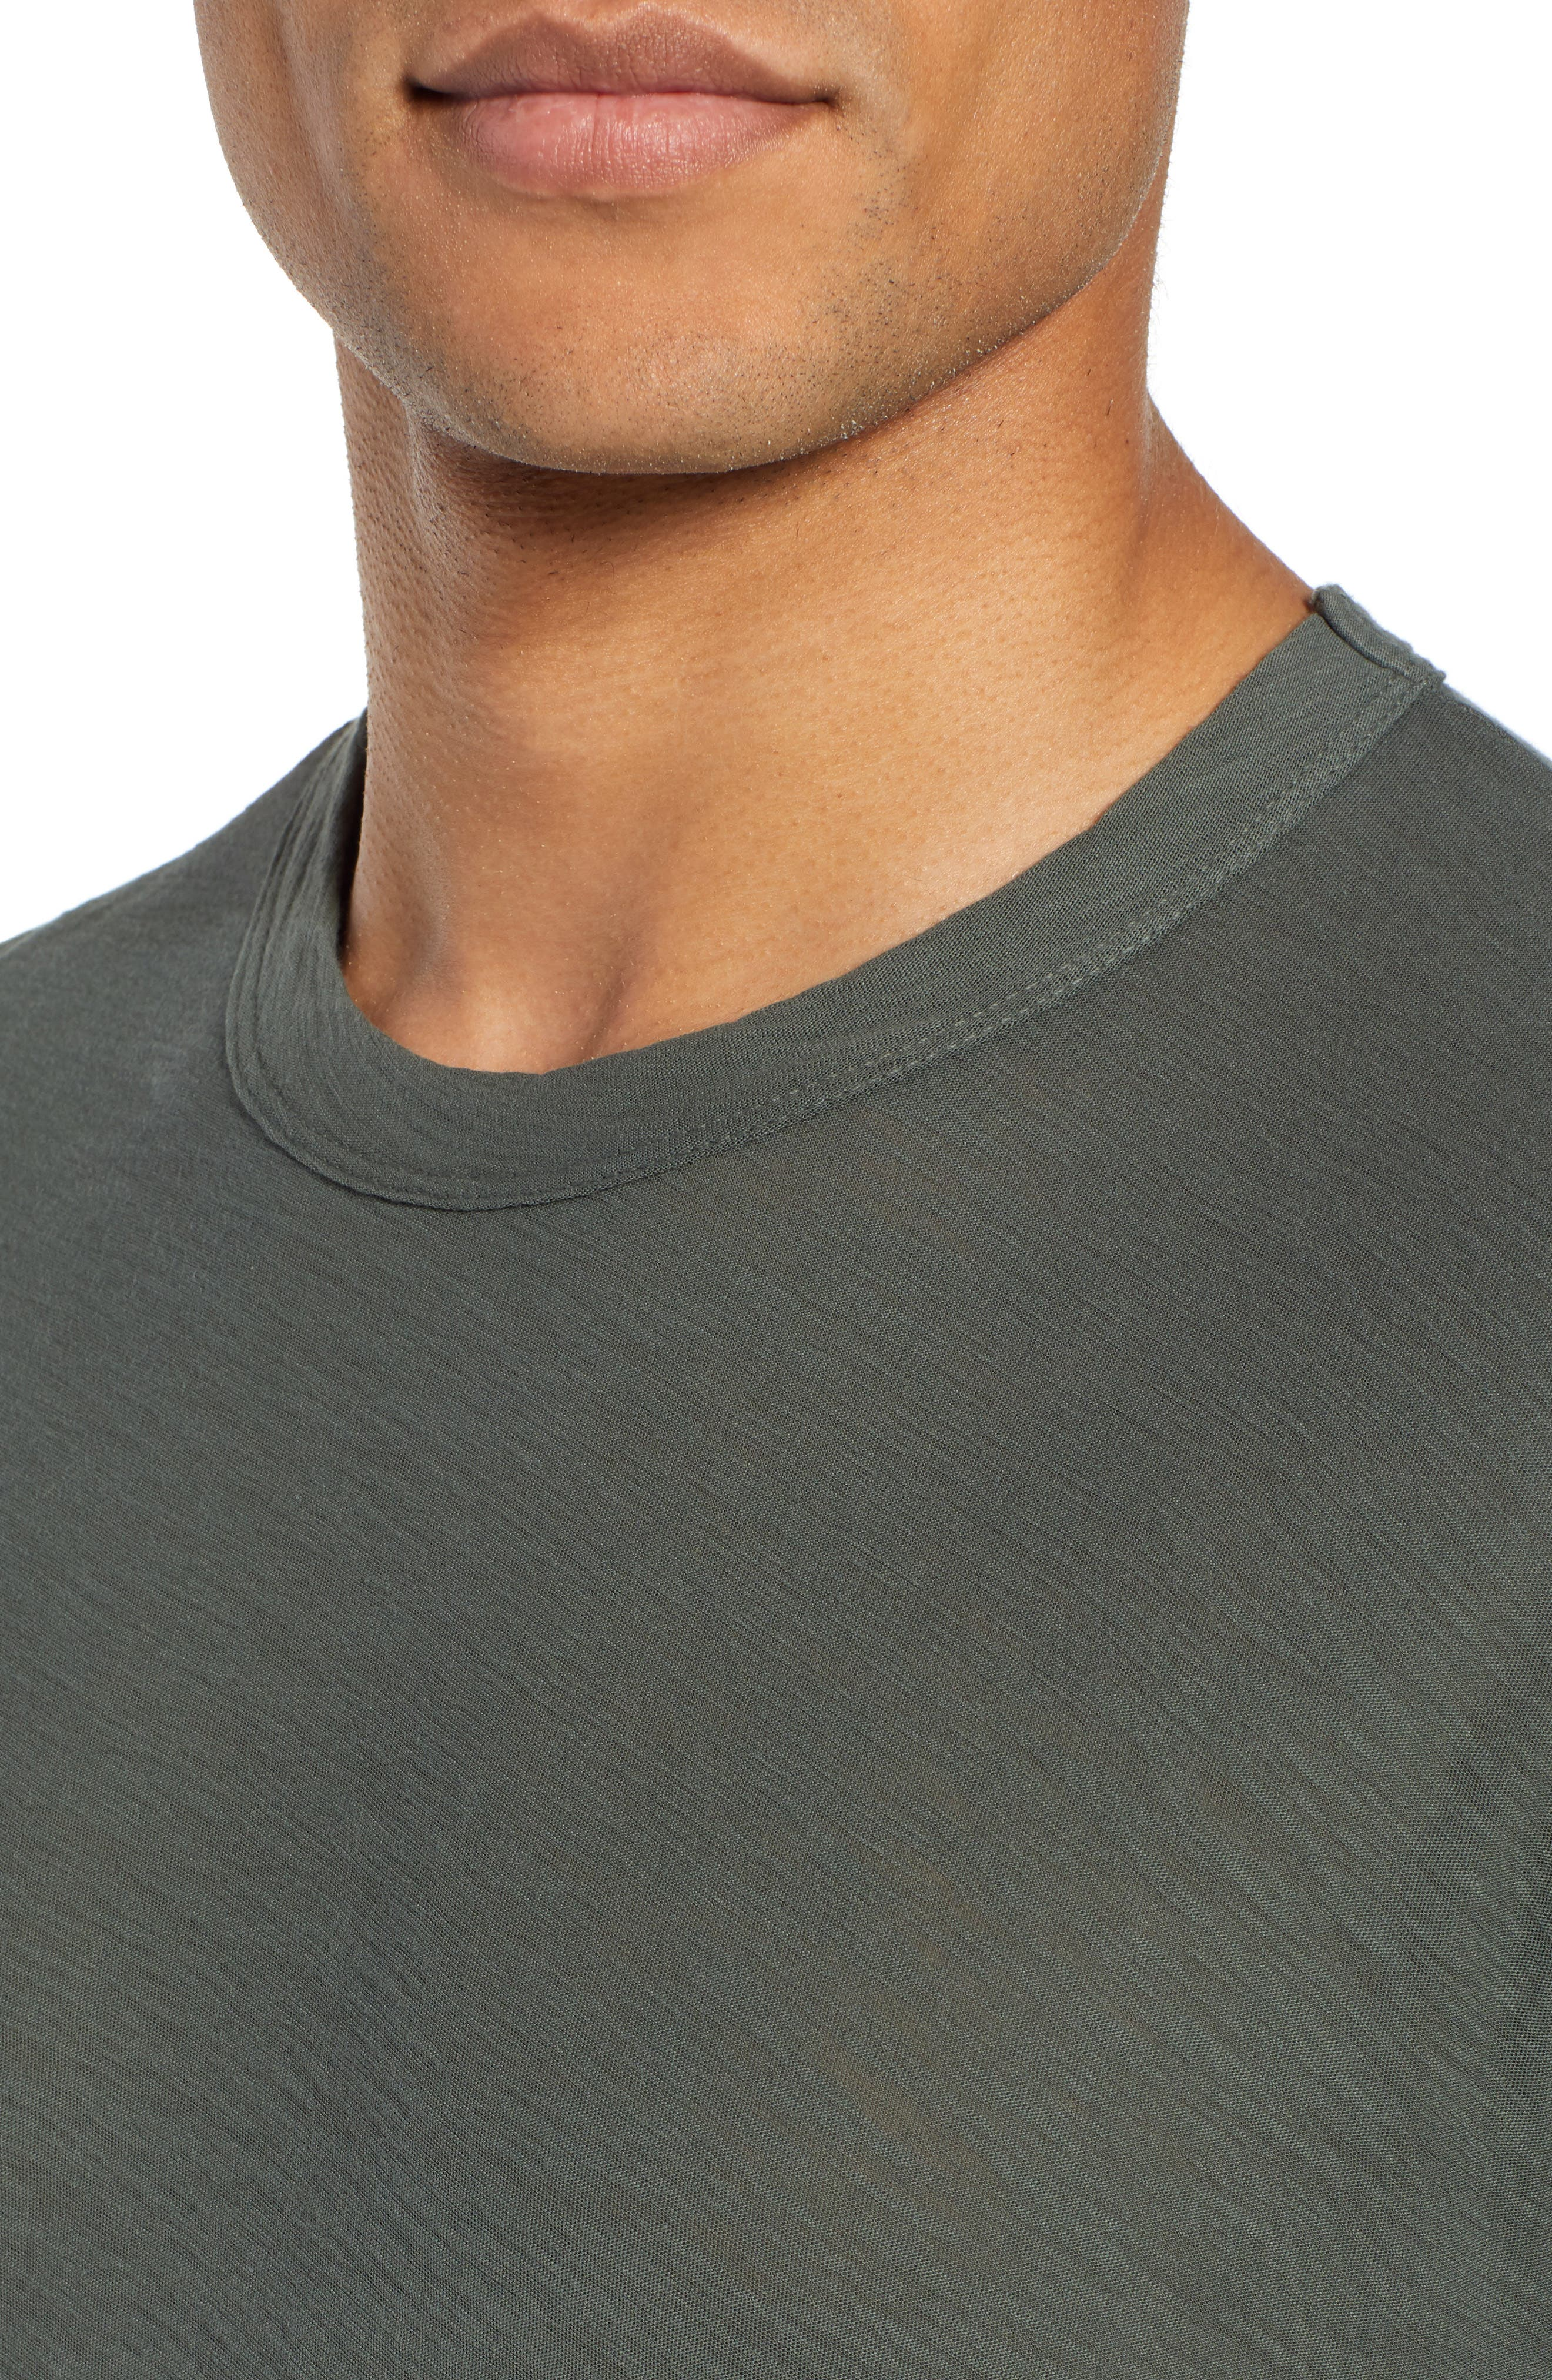 Regular Fit Shirt,                             Alternate thumbnail 4, color,                             304